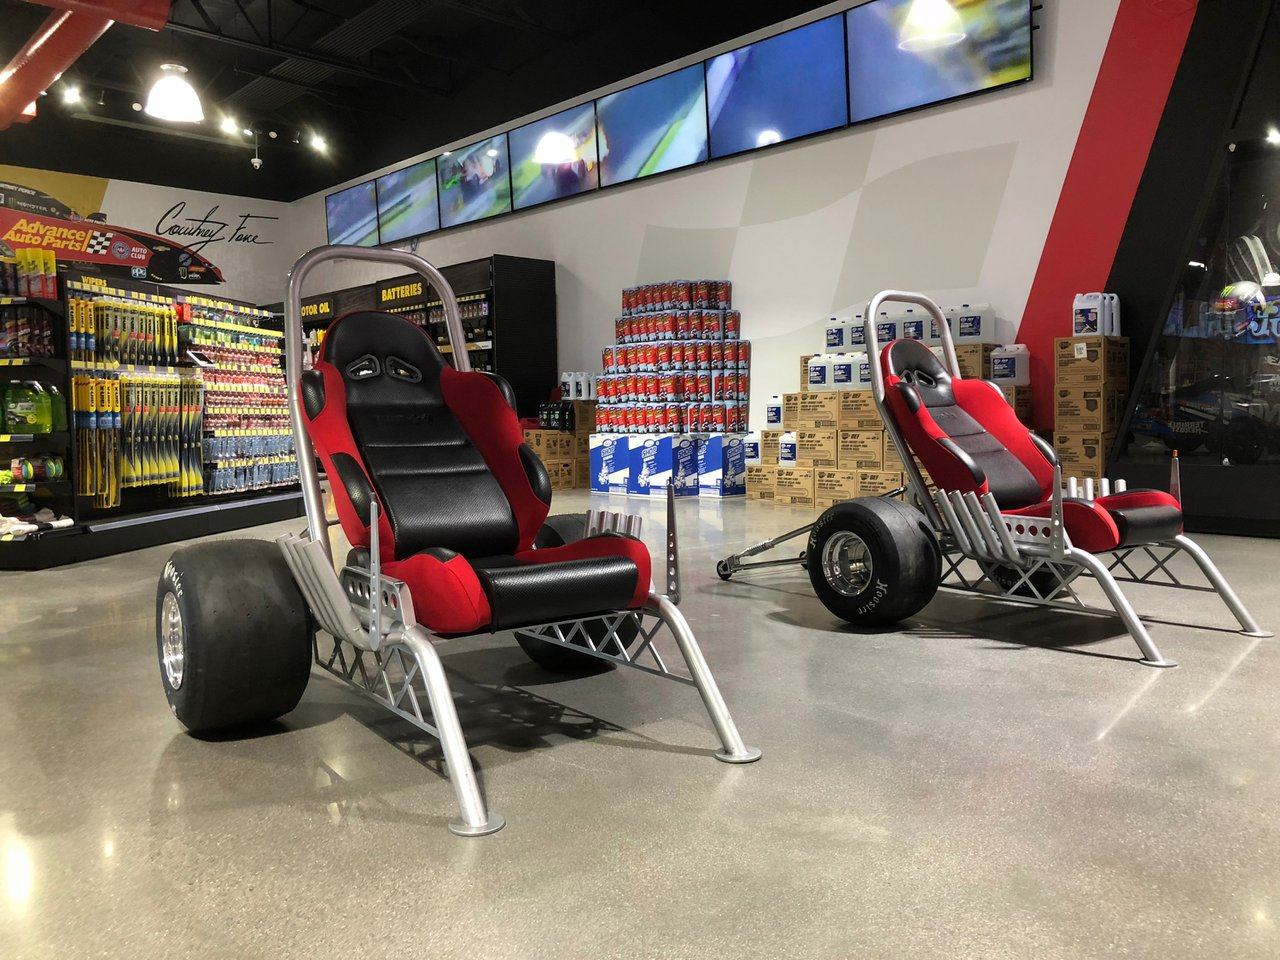 Advance Auto Parts Shop In Shop photo IMG_0693.jpg